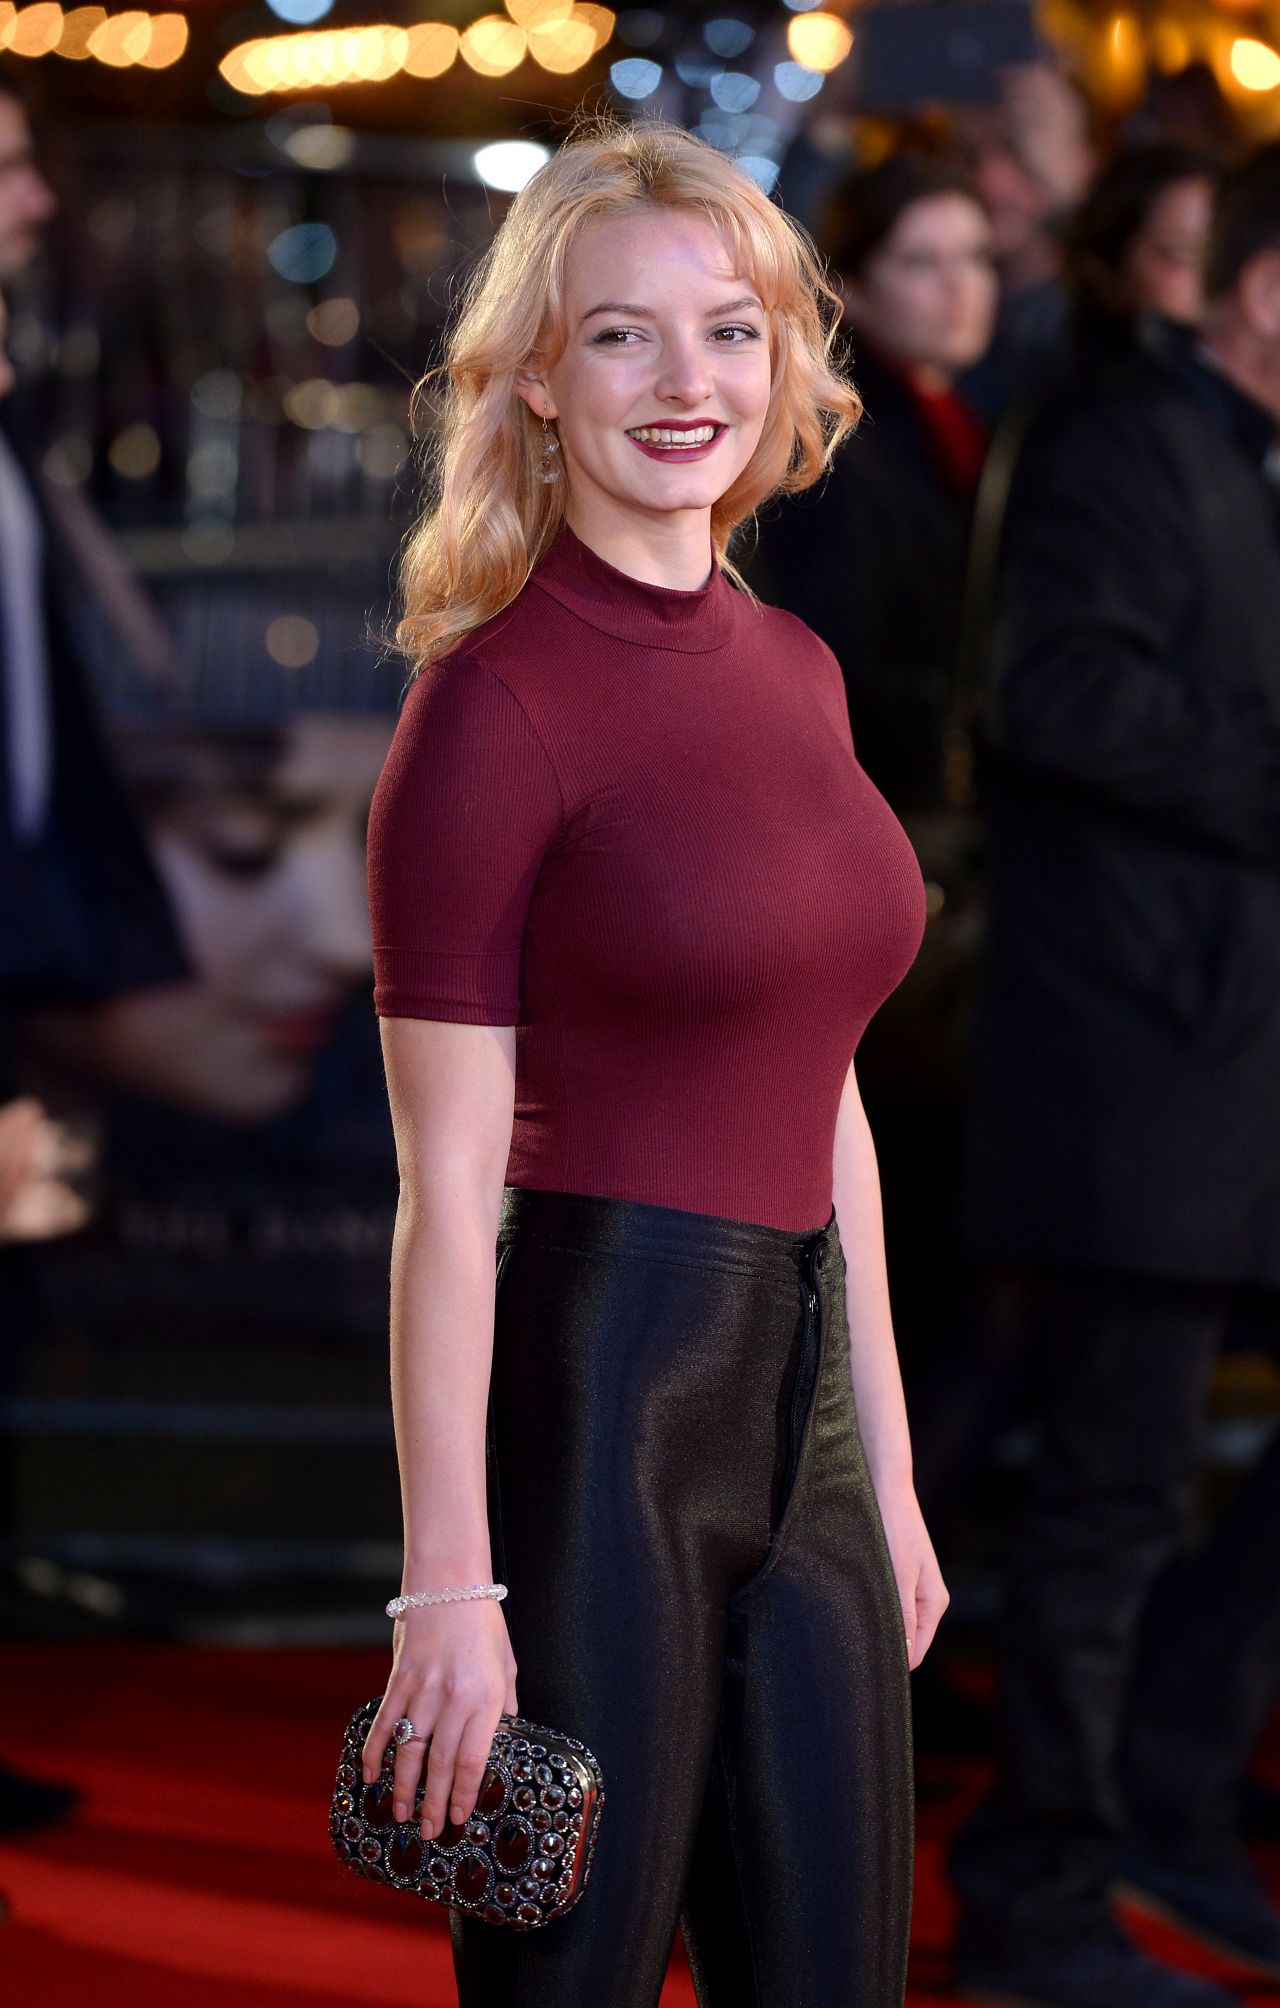 Dakota Blue Richards Sexy | The Fappening. 2014-2020